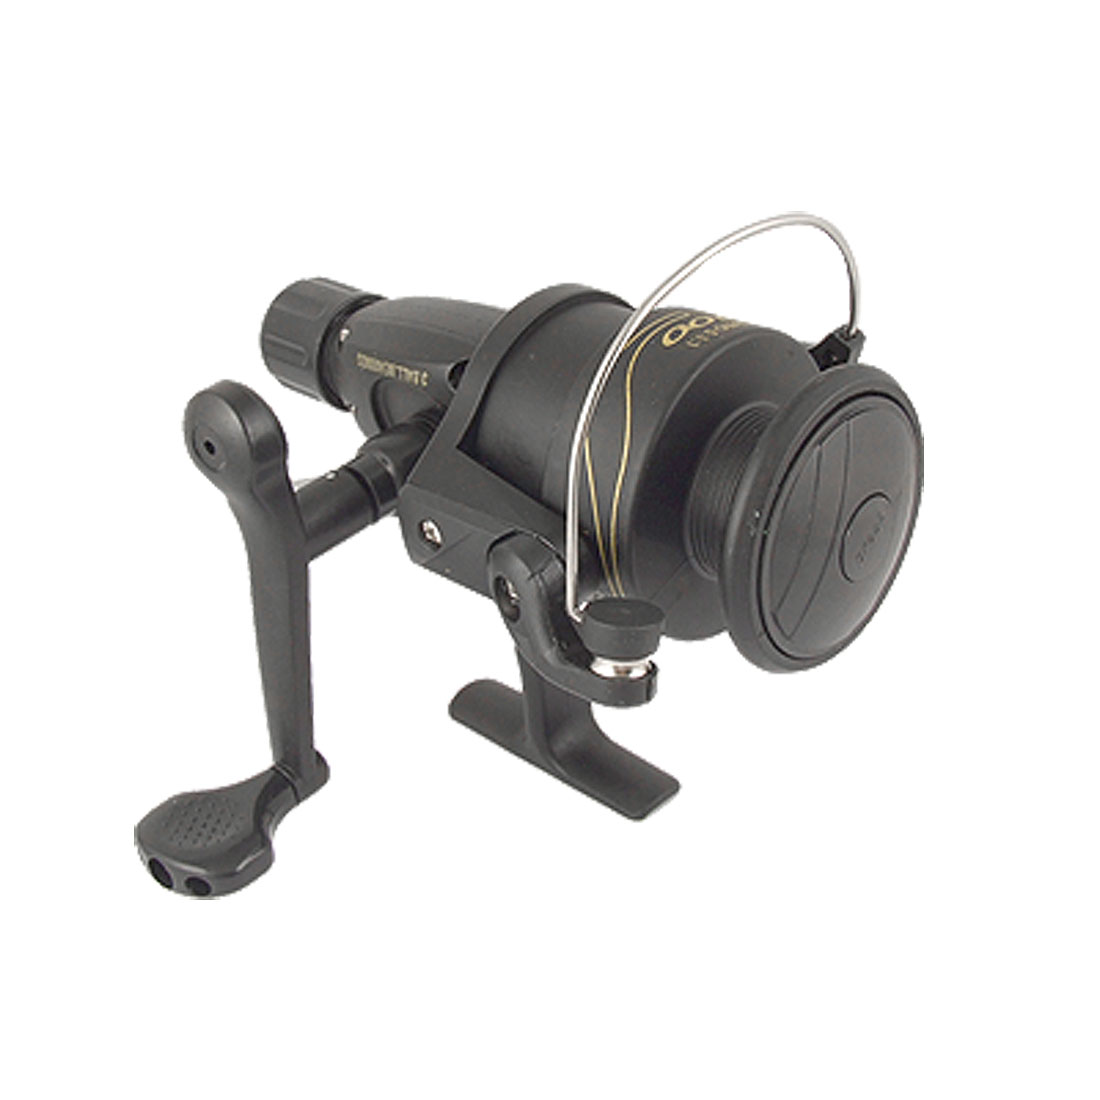 Gear Ratio 5.1:1 3-Ball Bearings Black Fishing Spinning Reel